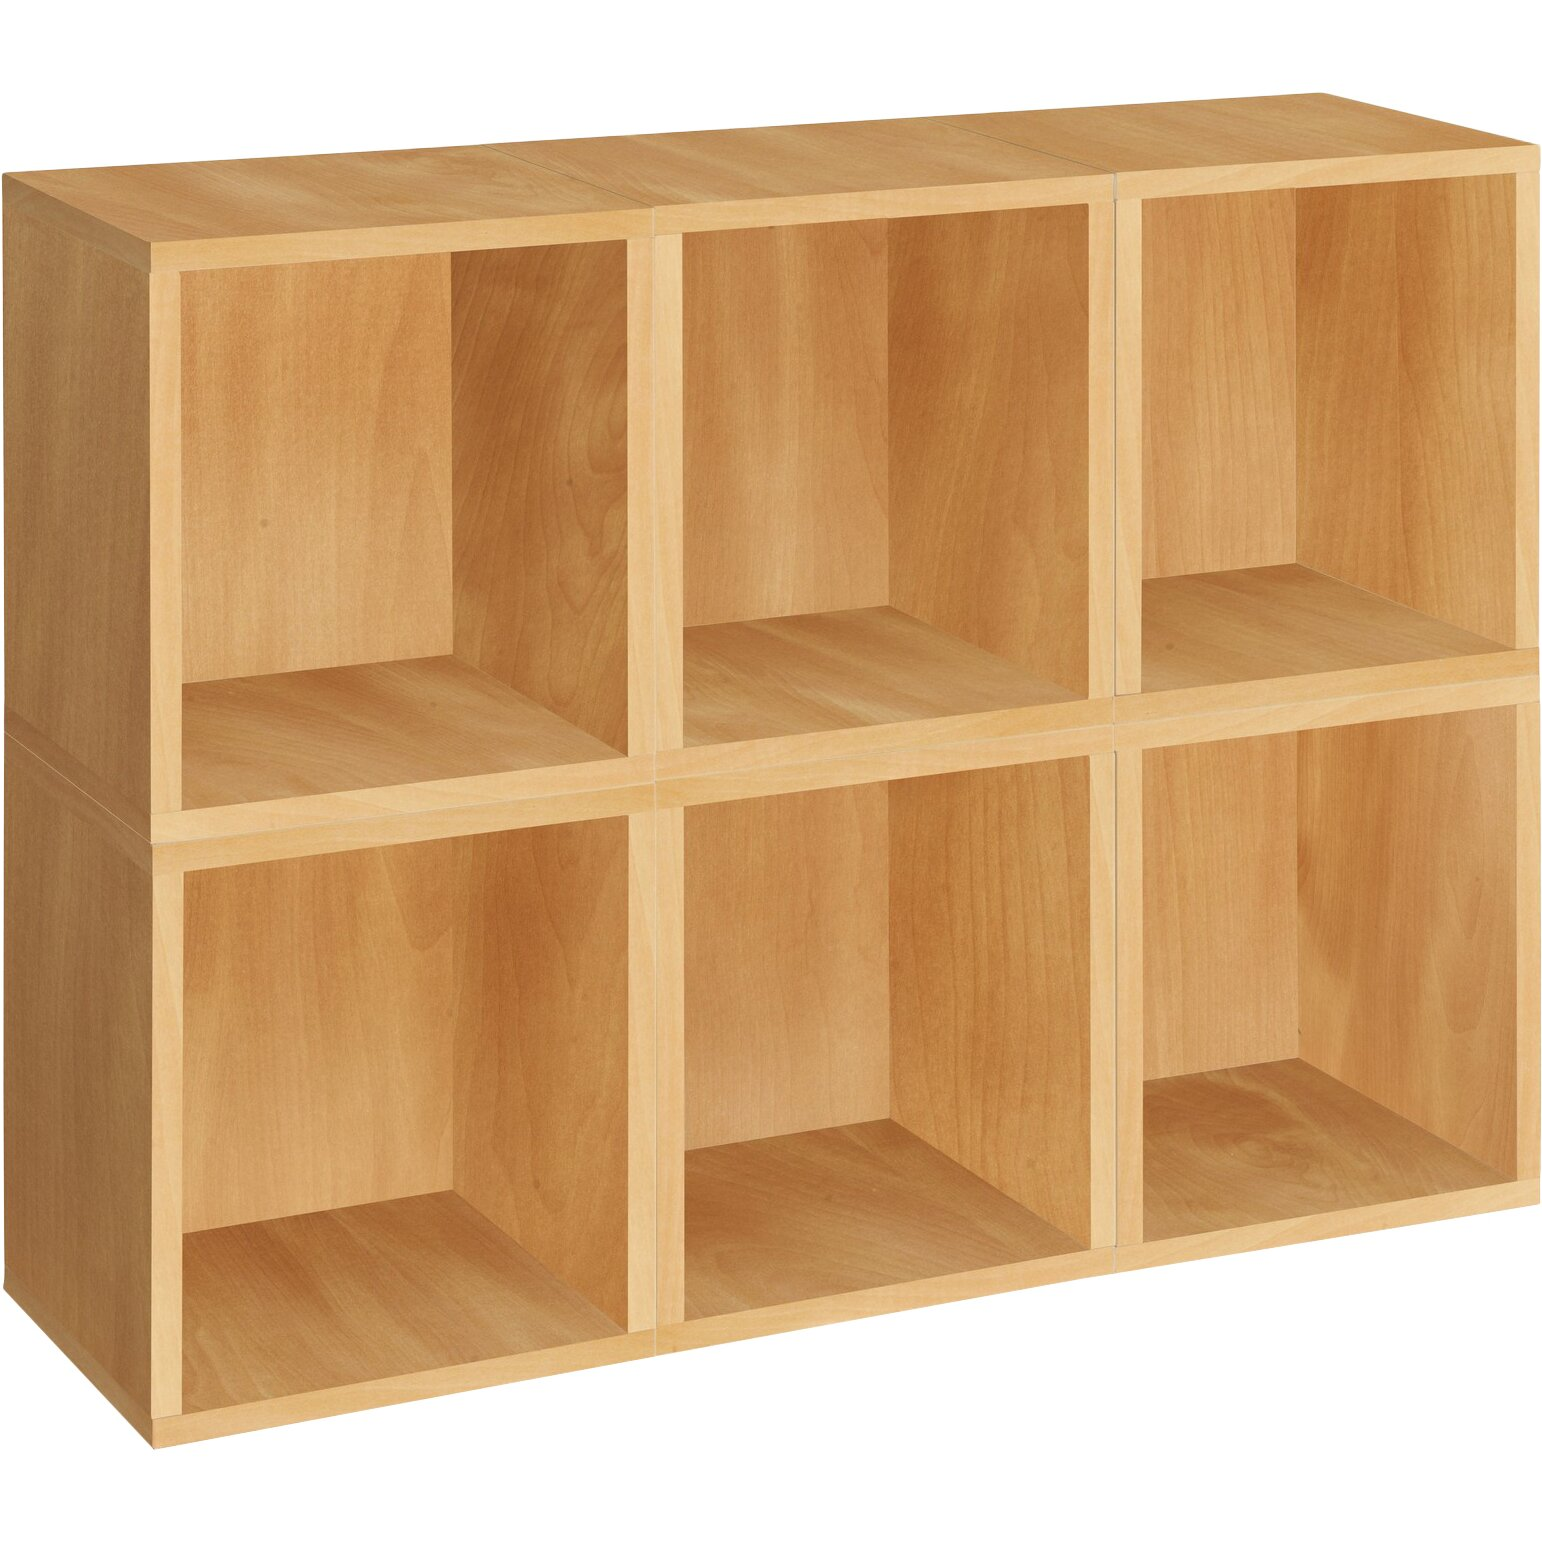 Way Basics Zboard Storage Modular Plus 31 Cube Unit